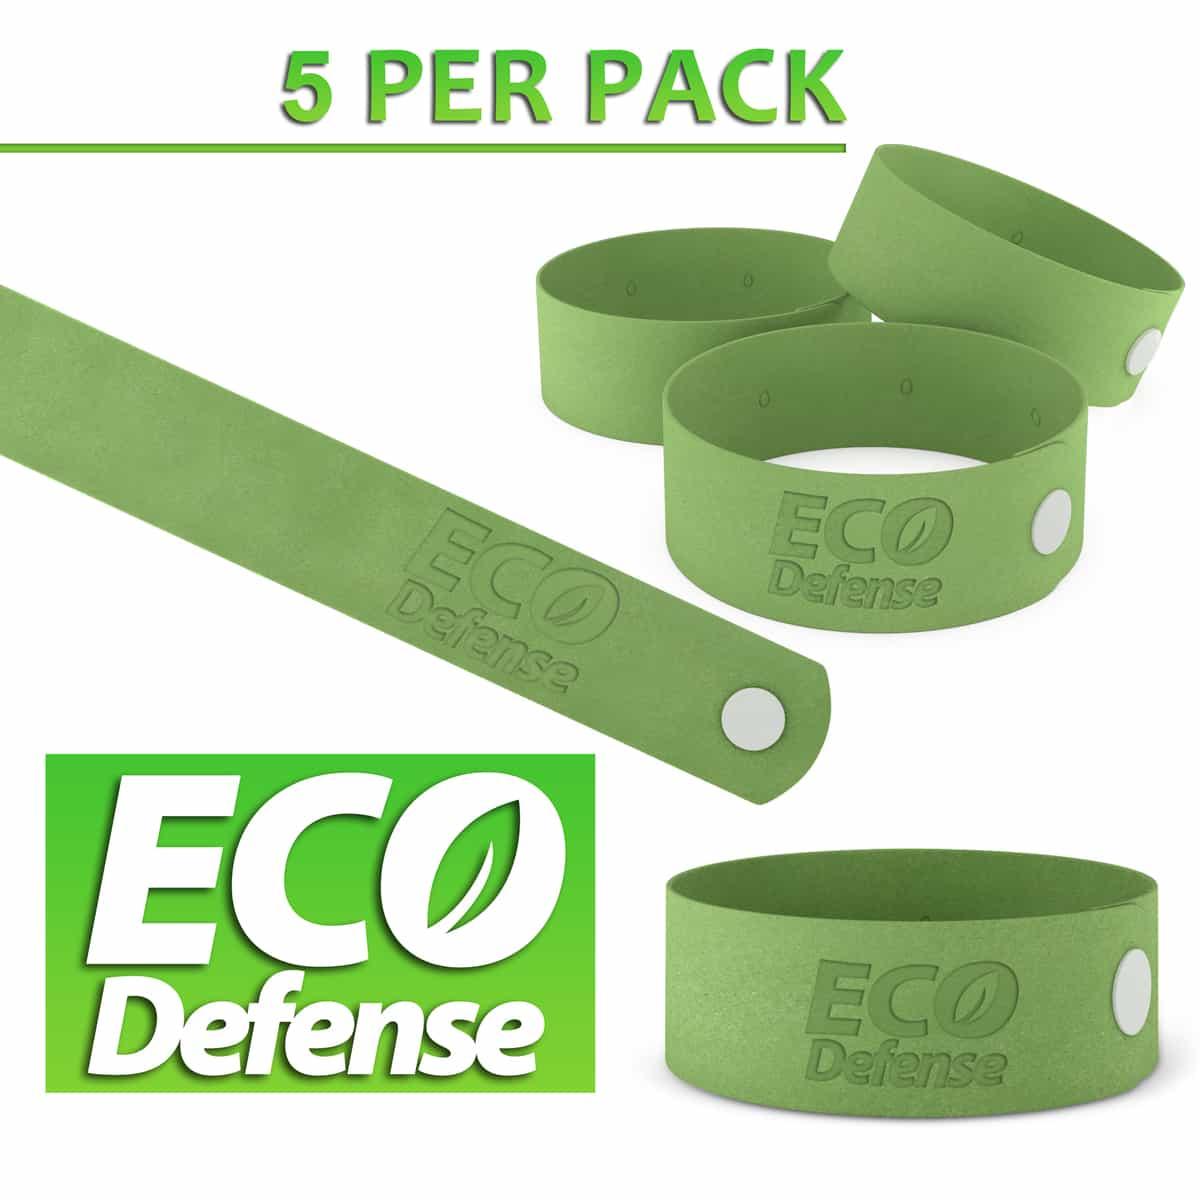 5 Pack ECO Defense Mosquito Repellent bracelets